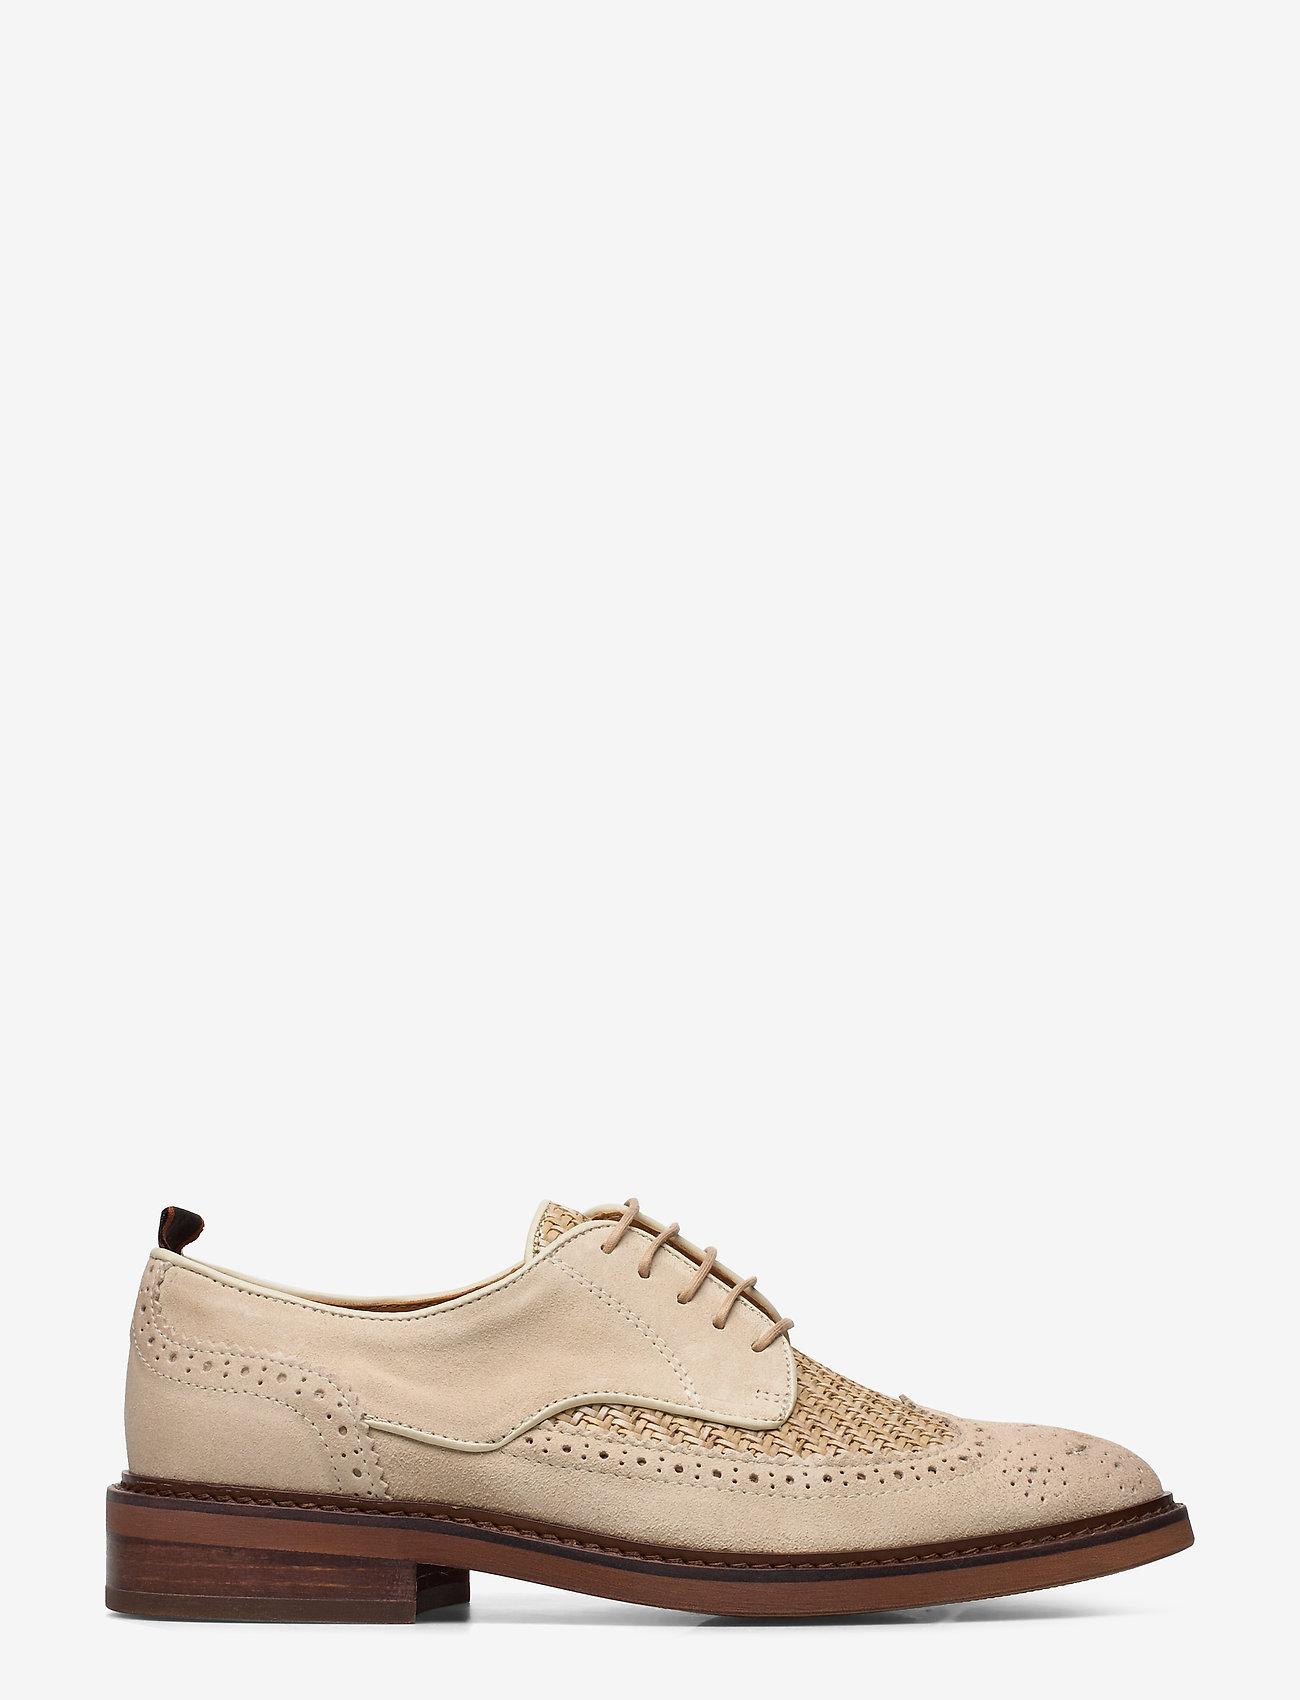 Scotch & Soda Shoes - Merapi Low lace - snøresko - sand - 1